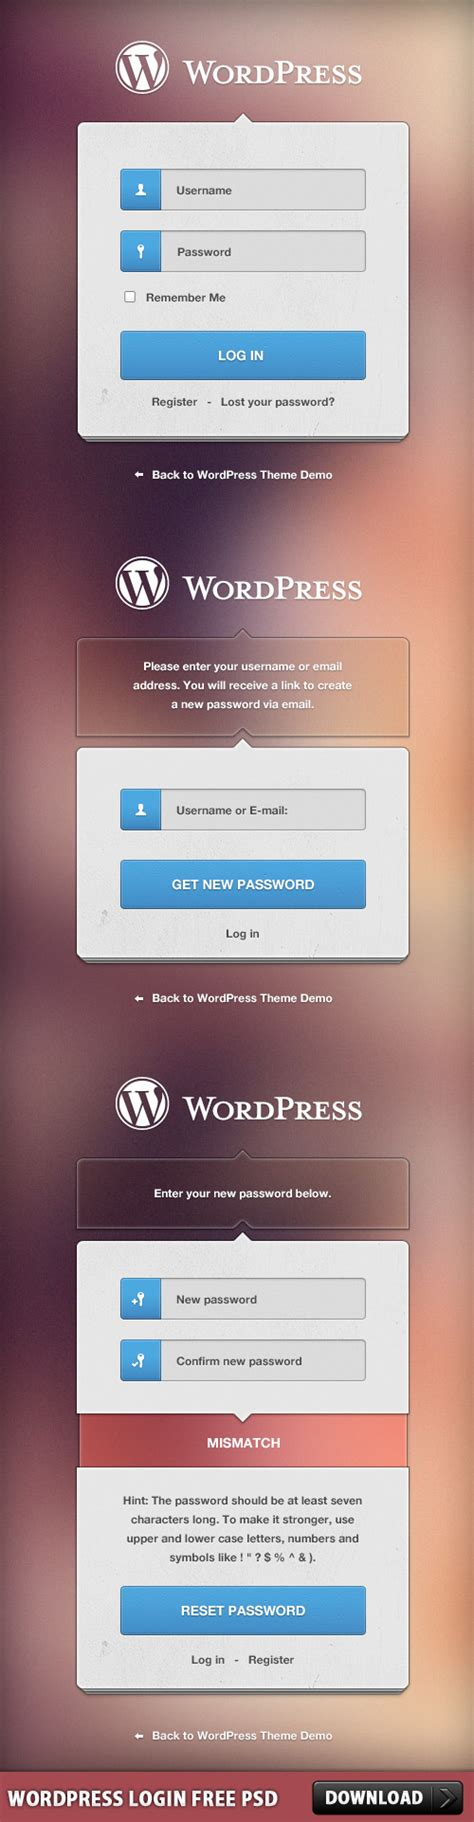 wordpress themes free login wordpress login free psd download download psd